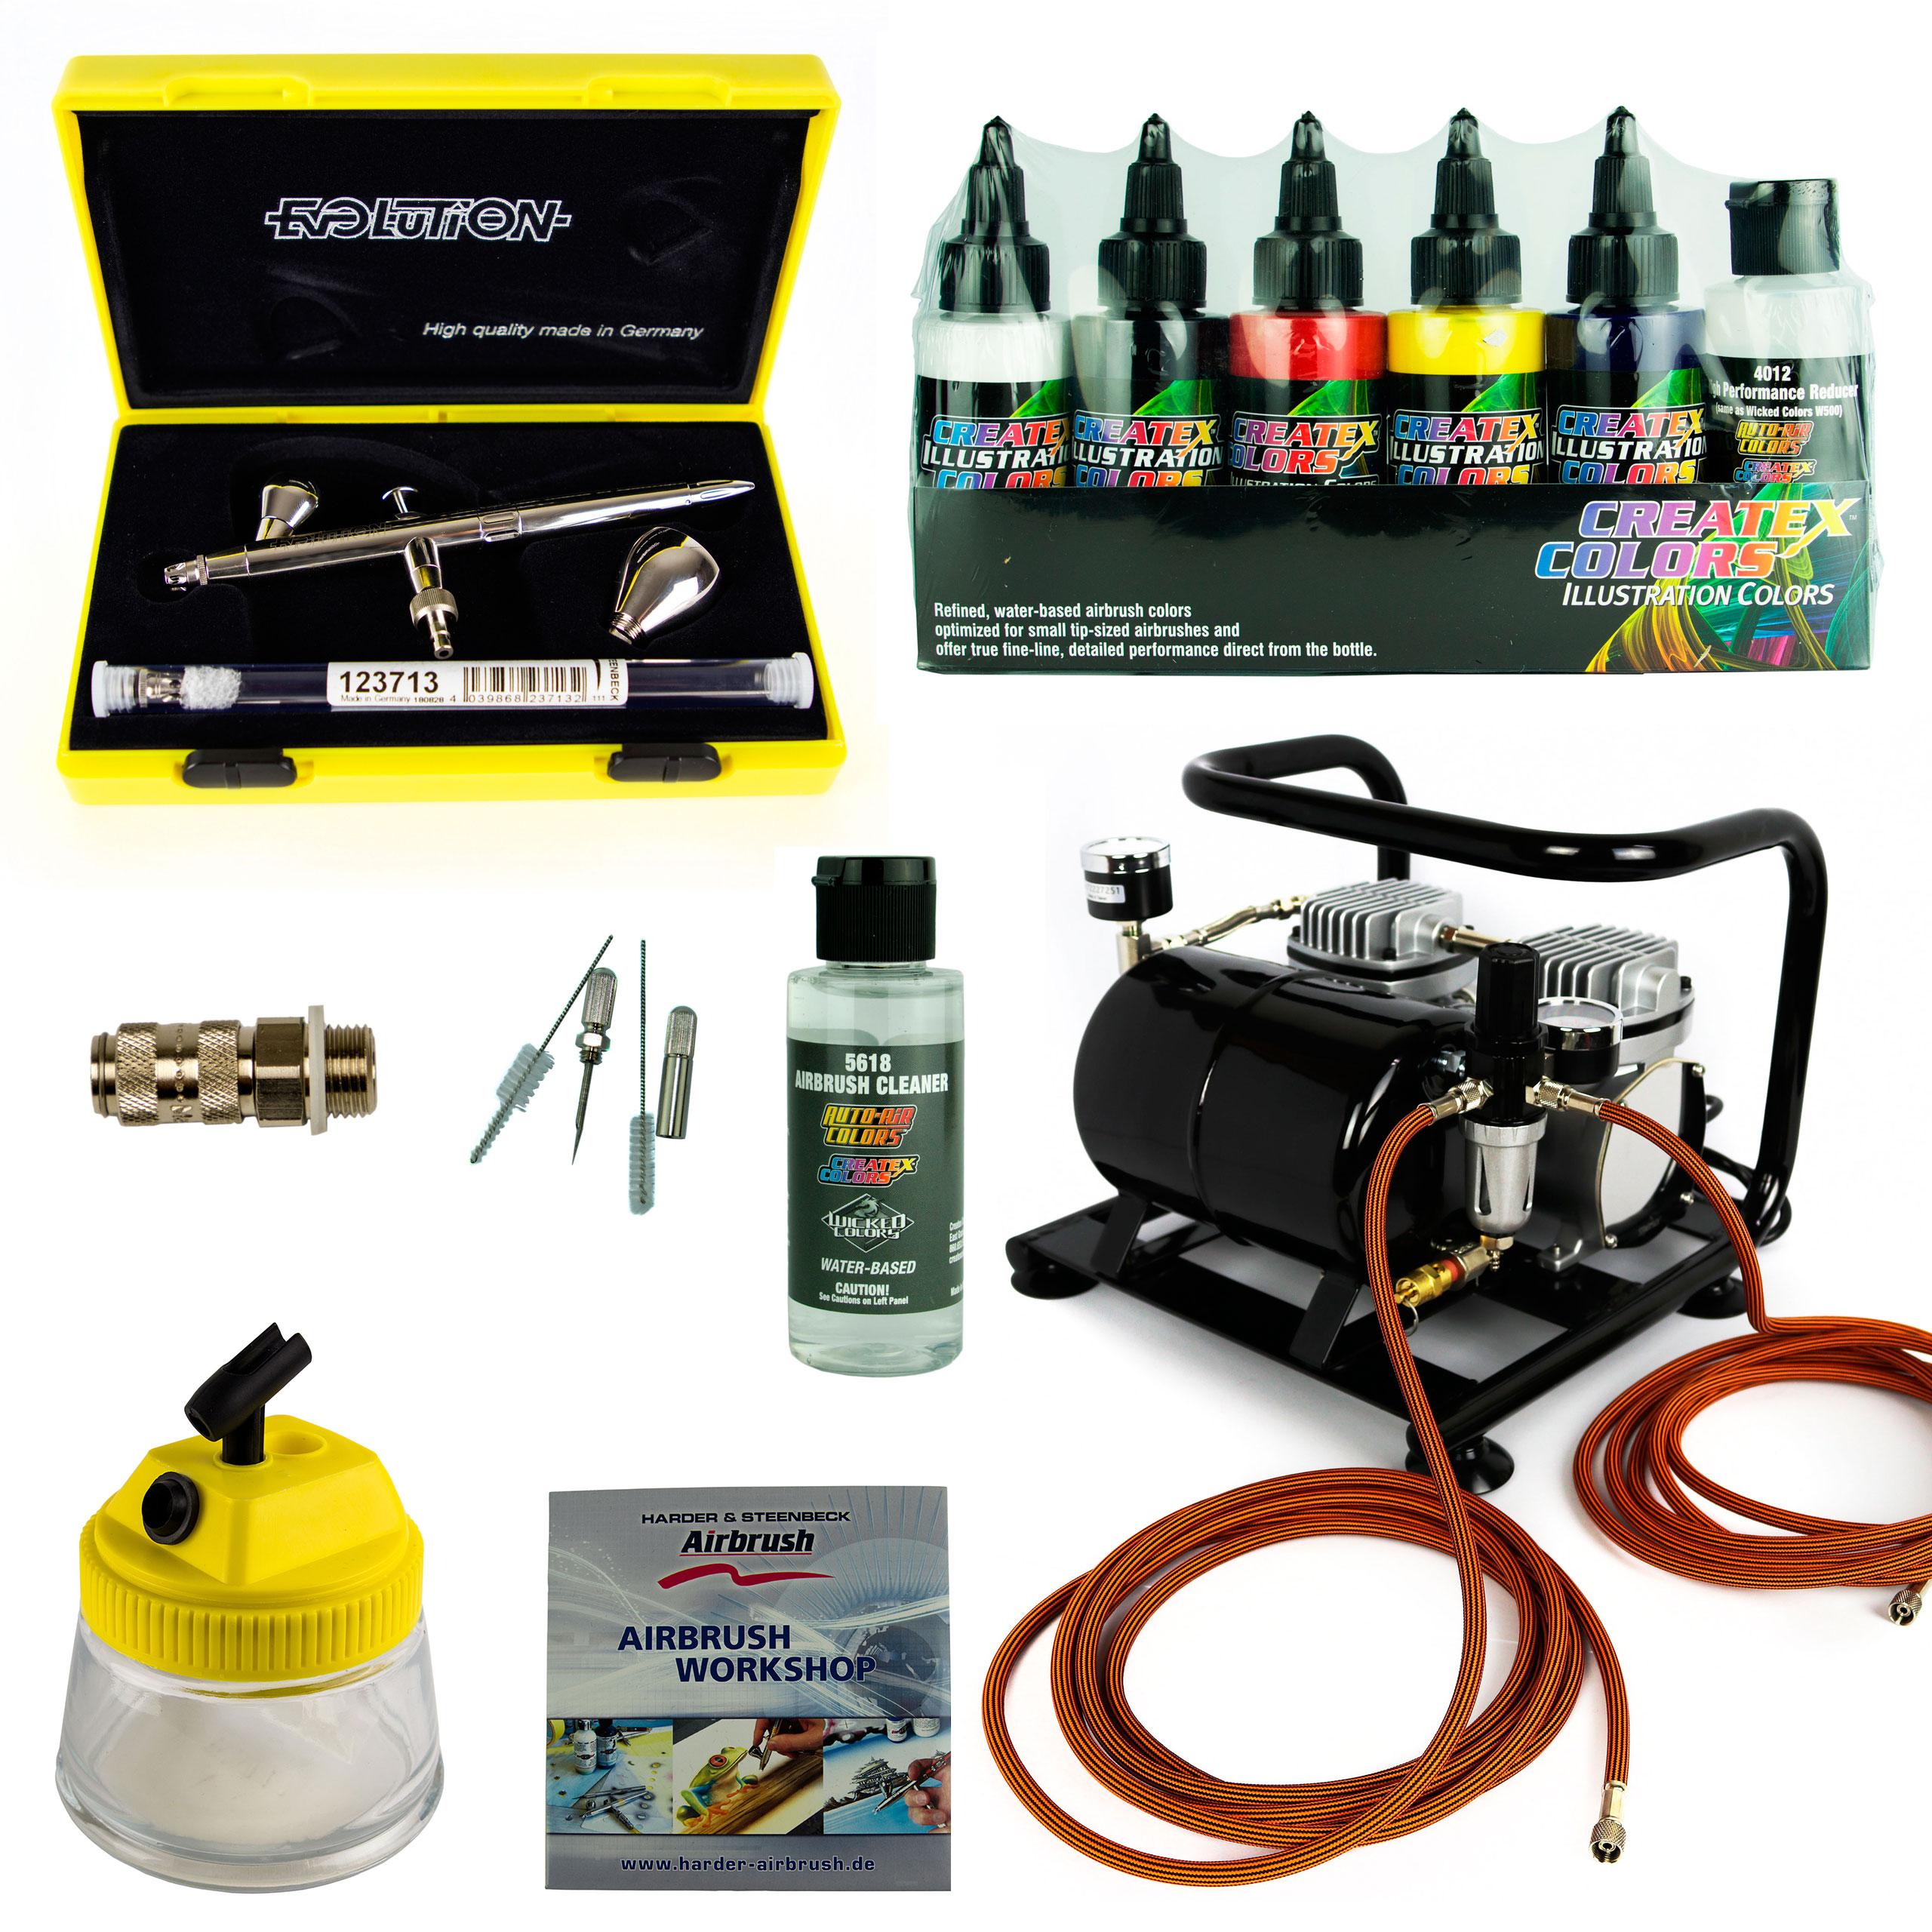 Fine-Art Airbrush Set - Evolution Silverline Two in One + Sparmax AC-500 Kompressor - Kit 9202